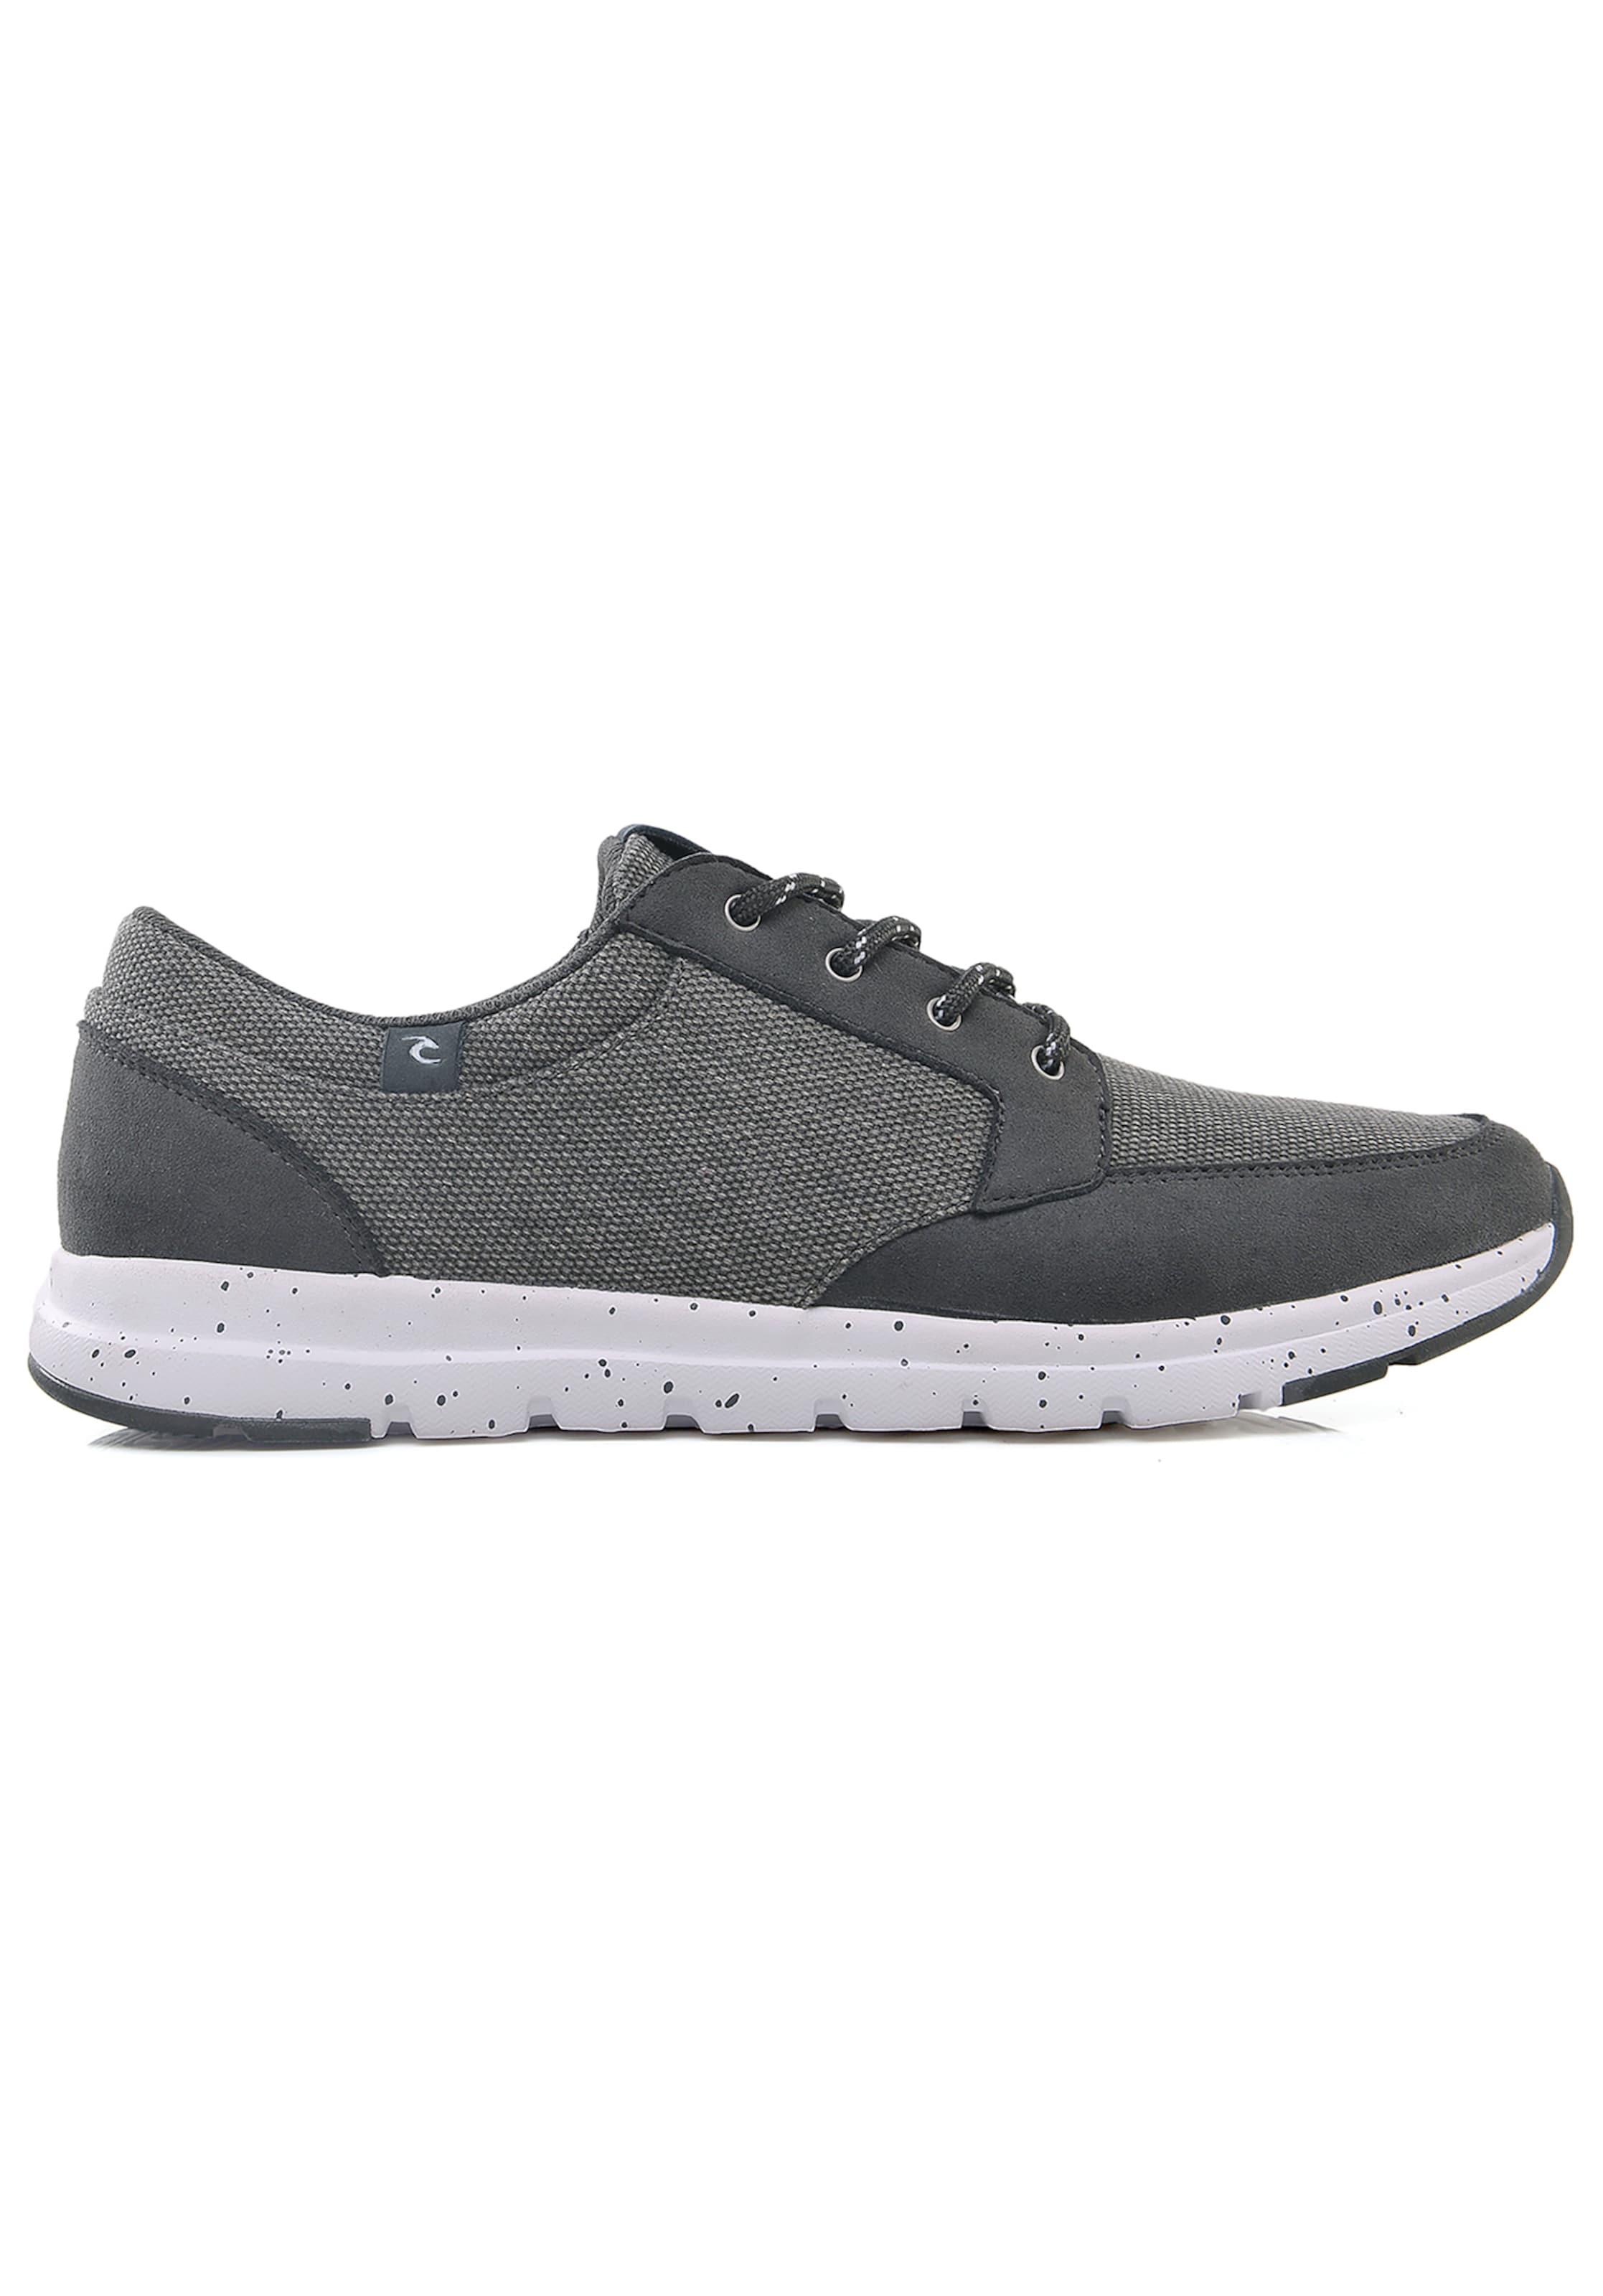 RIP CURL Sneaker Commuter Verschleißfeste billige Schuhe